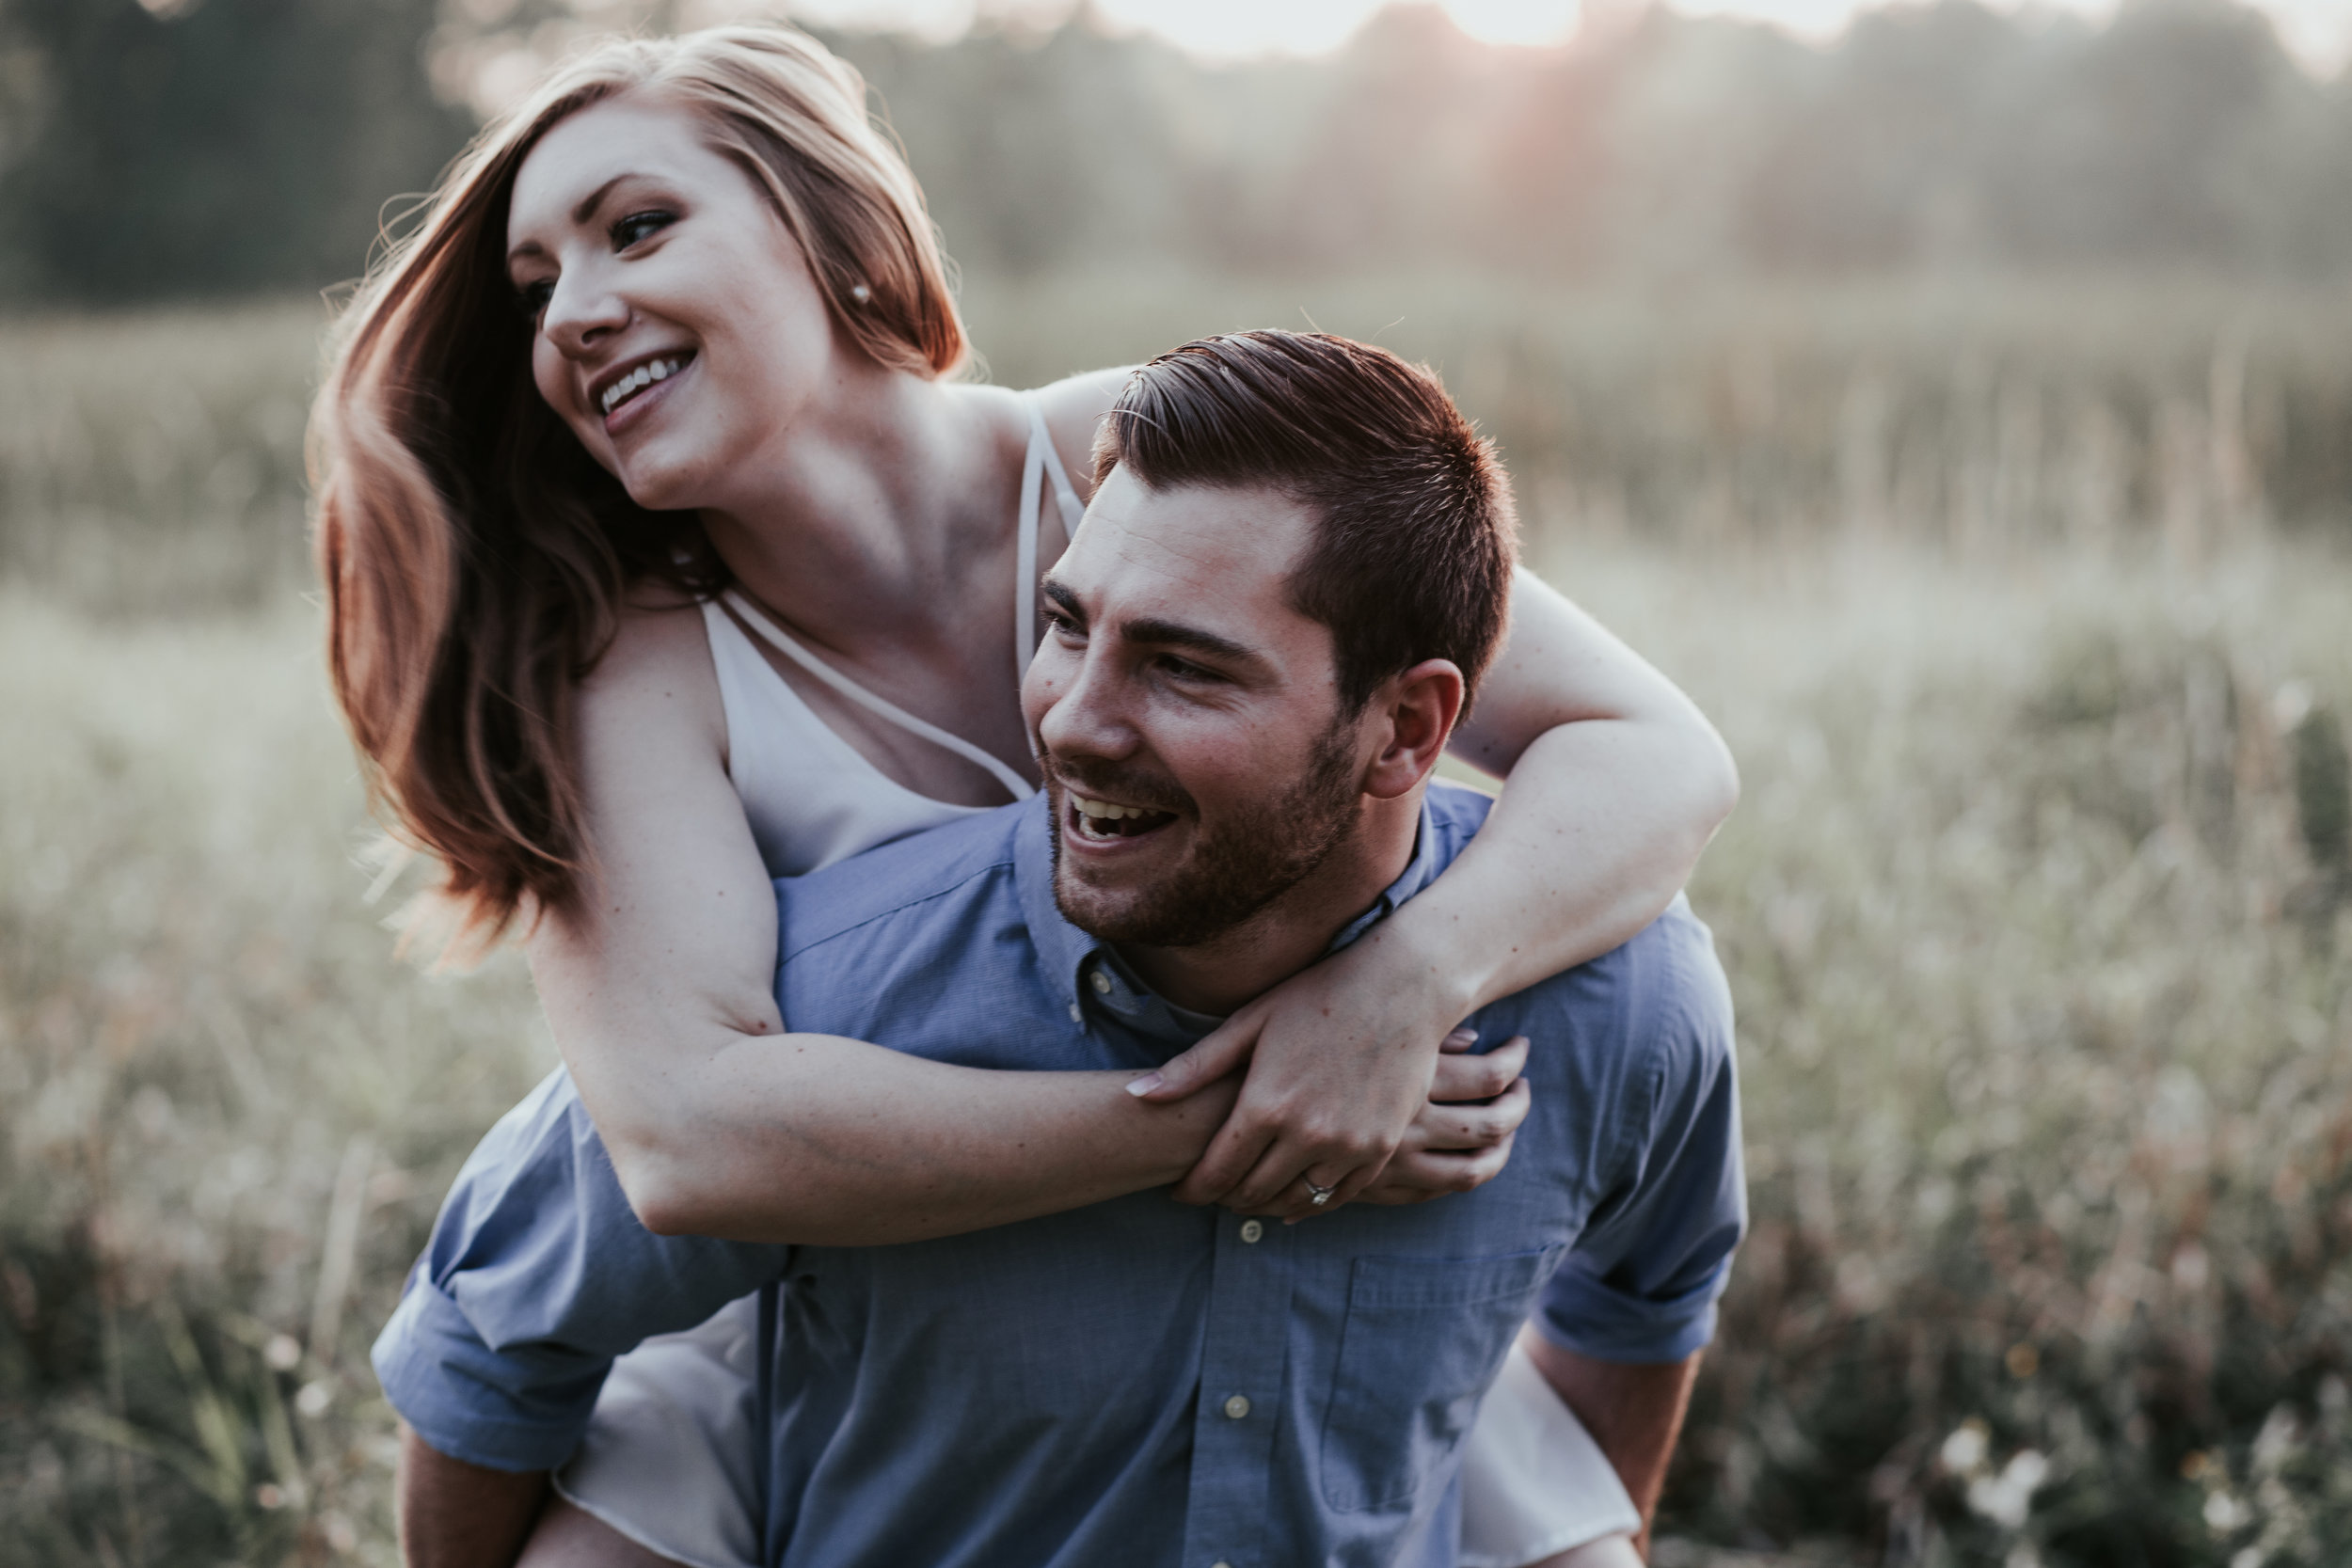 Golden Hour Engagement Session - Hove Photography LLC  International Wedding Photographer